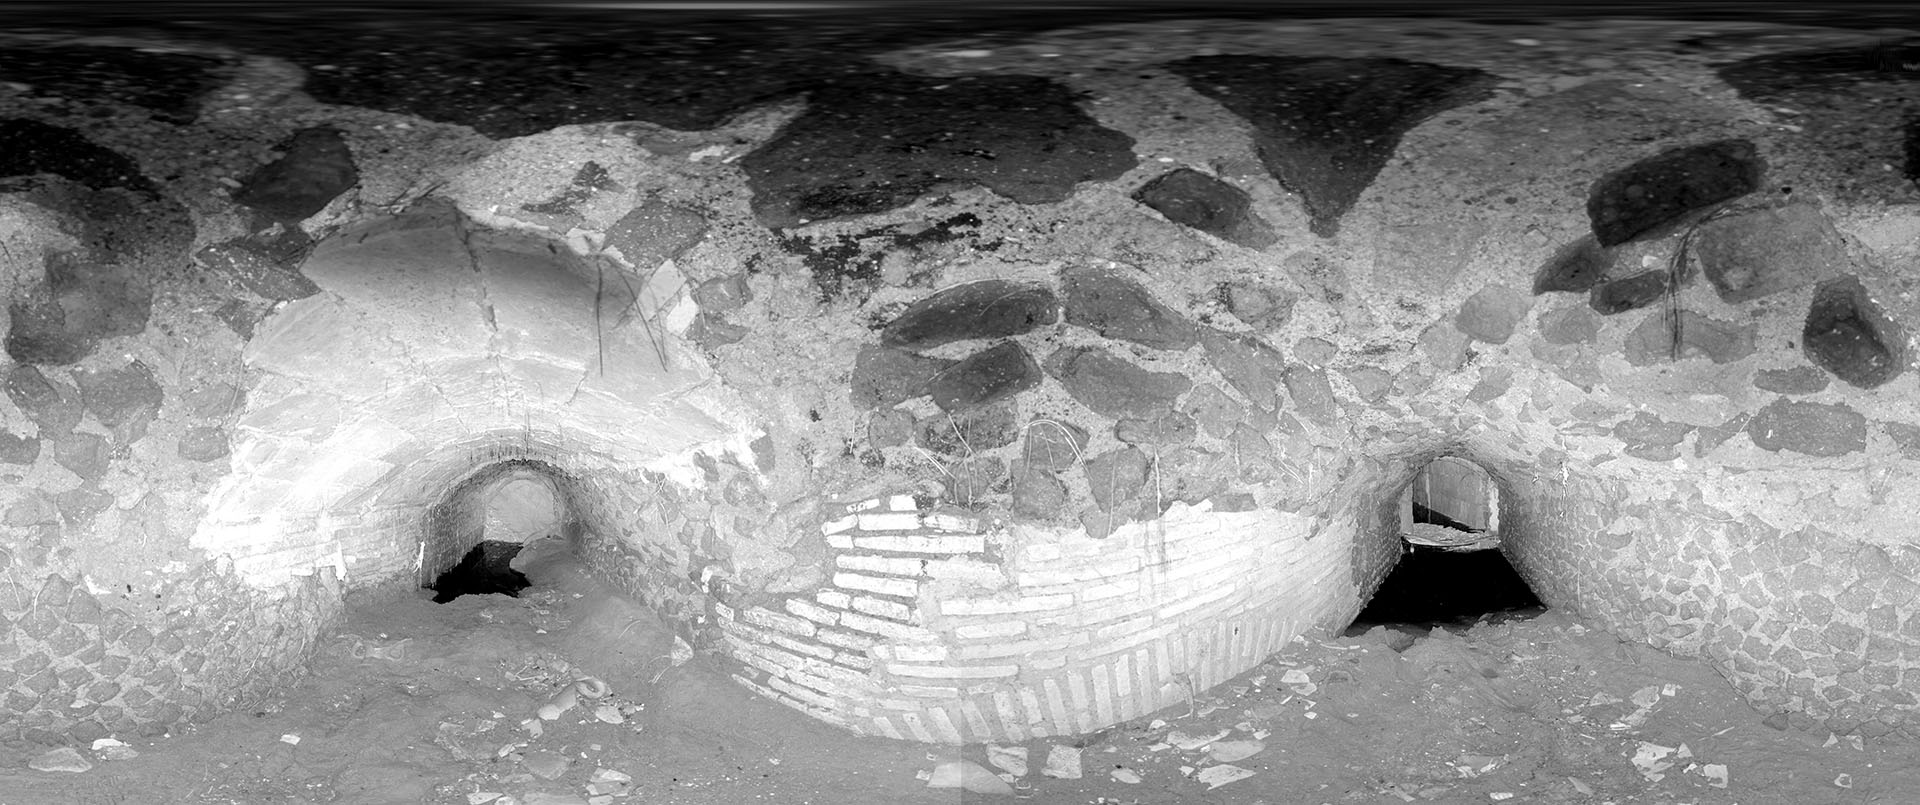 Imagen esférica desplegada, a partir del escaneado láser.